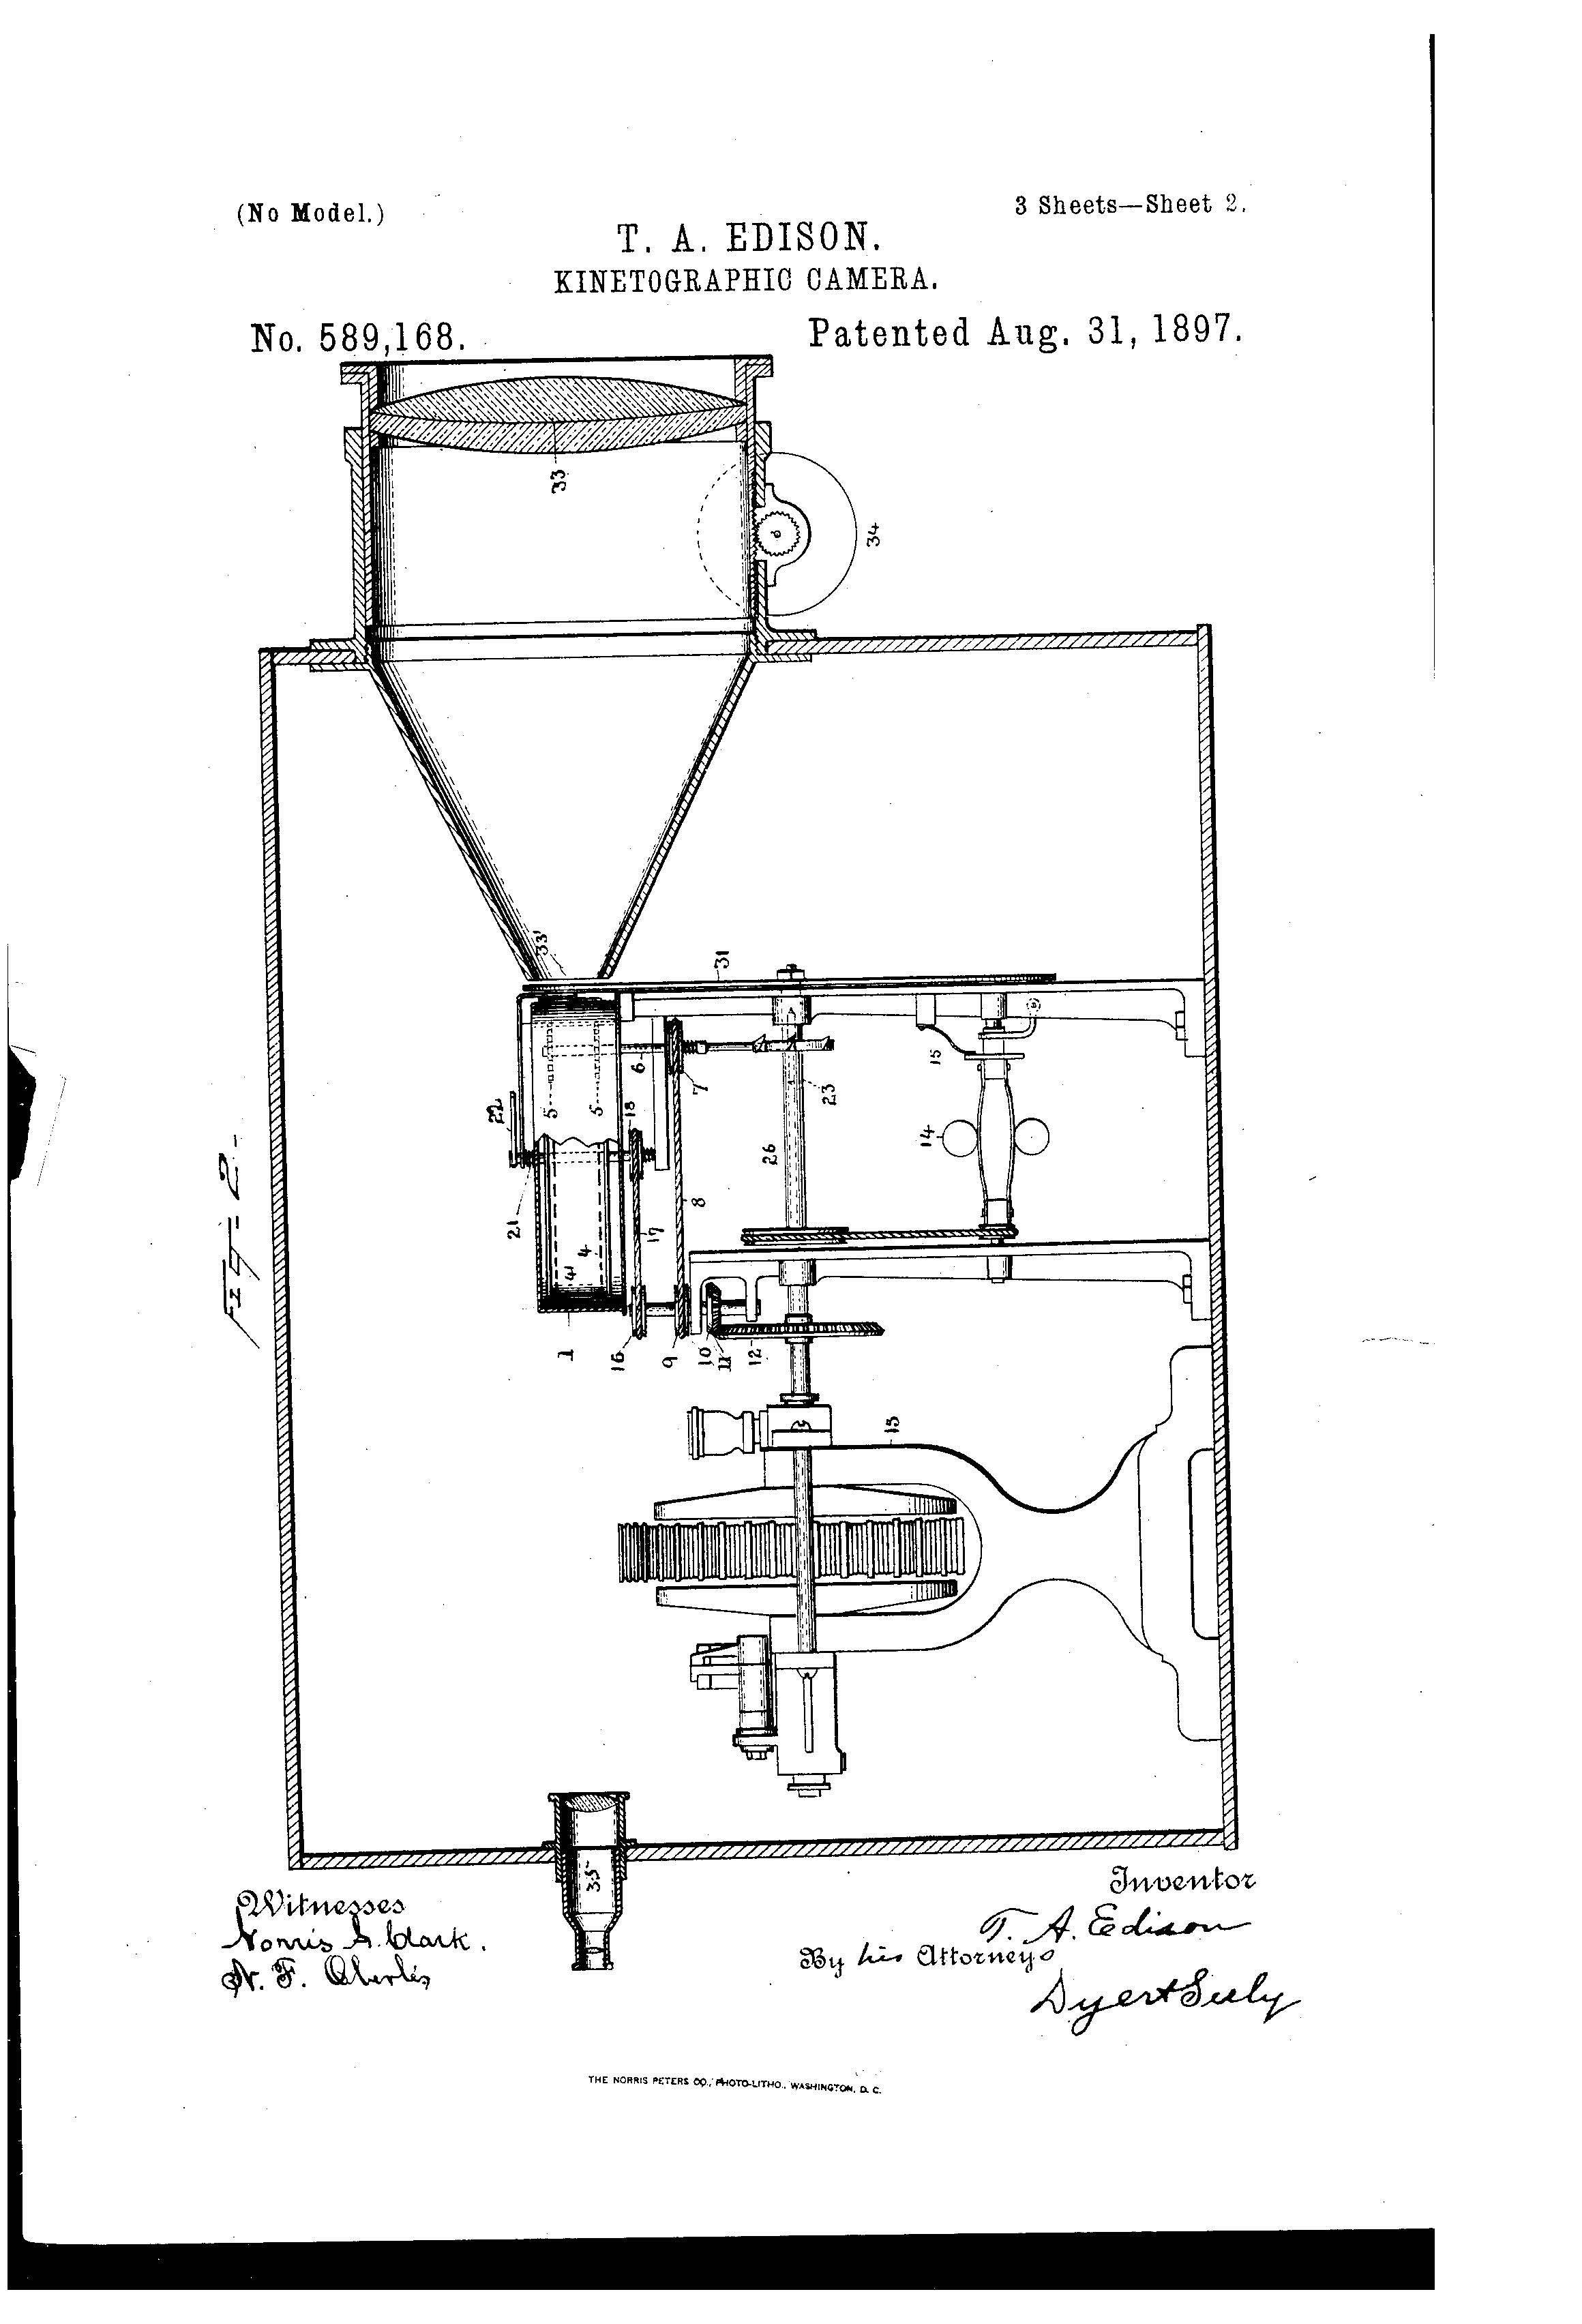 Kinetographic Camera Patent Diagram